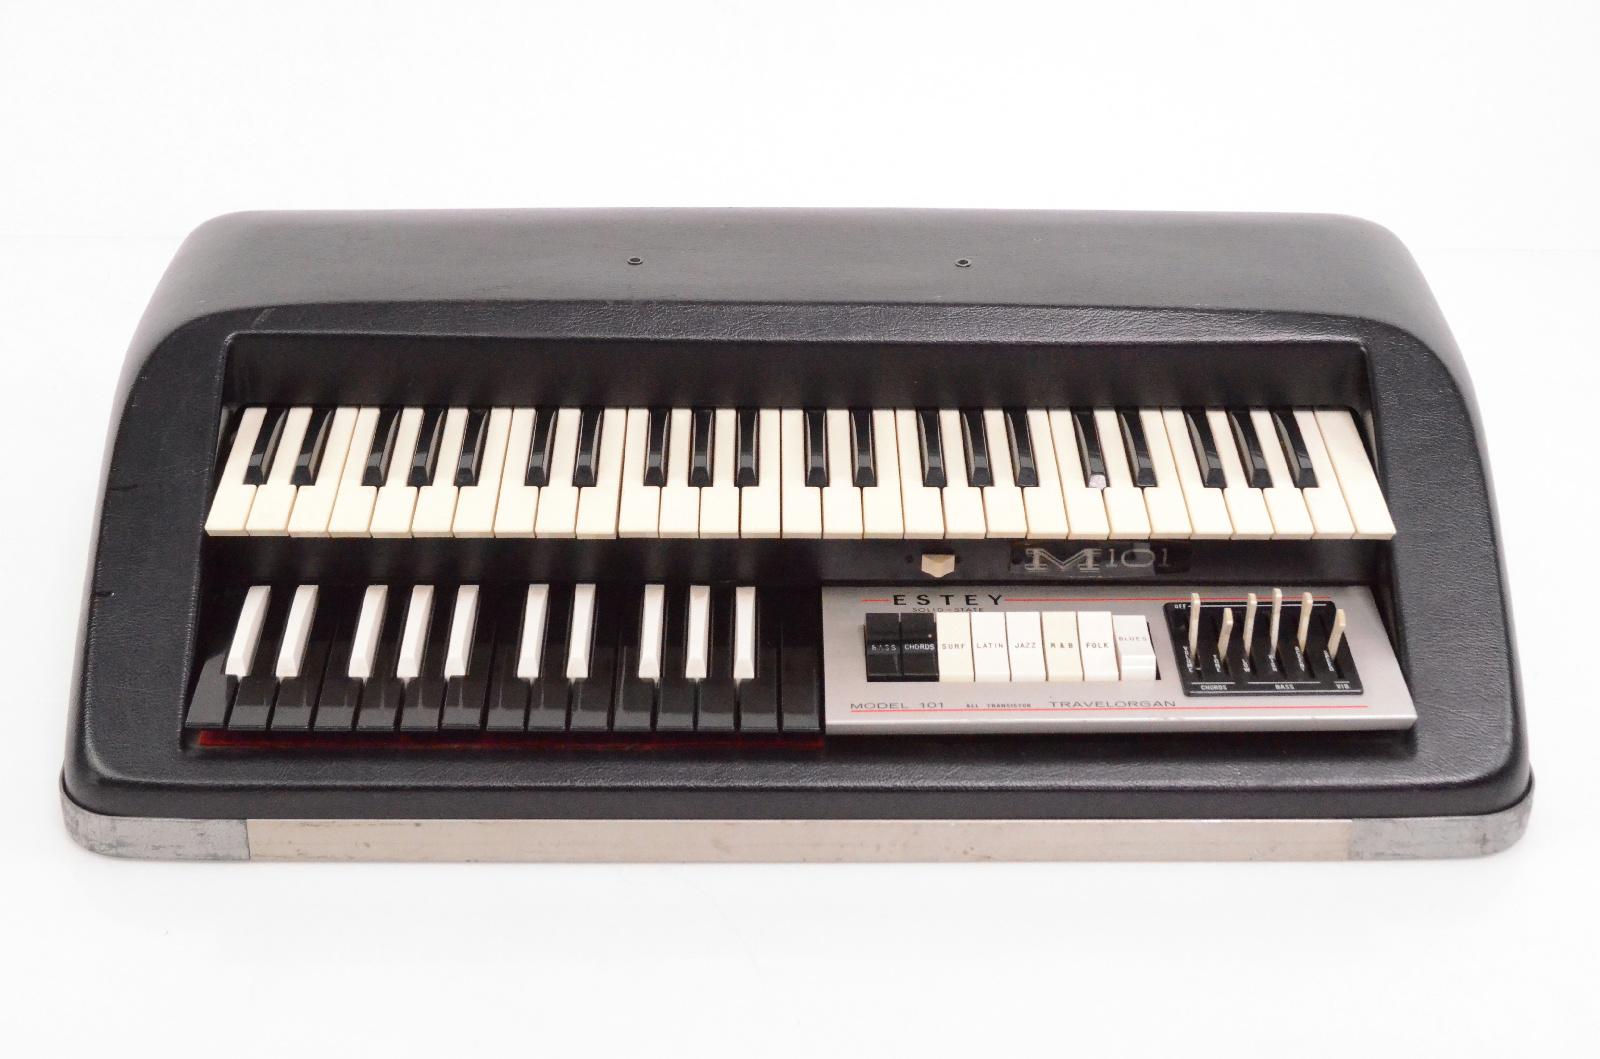 1966 Estey M-101 Solid-State Travelorgan Combo Portable Travel Organ M101 #32414